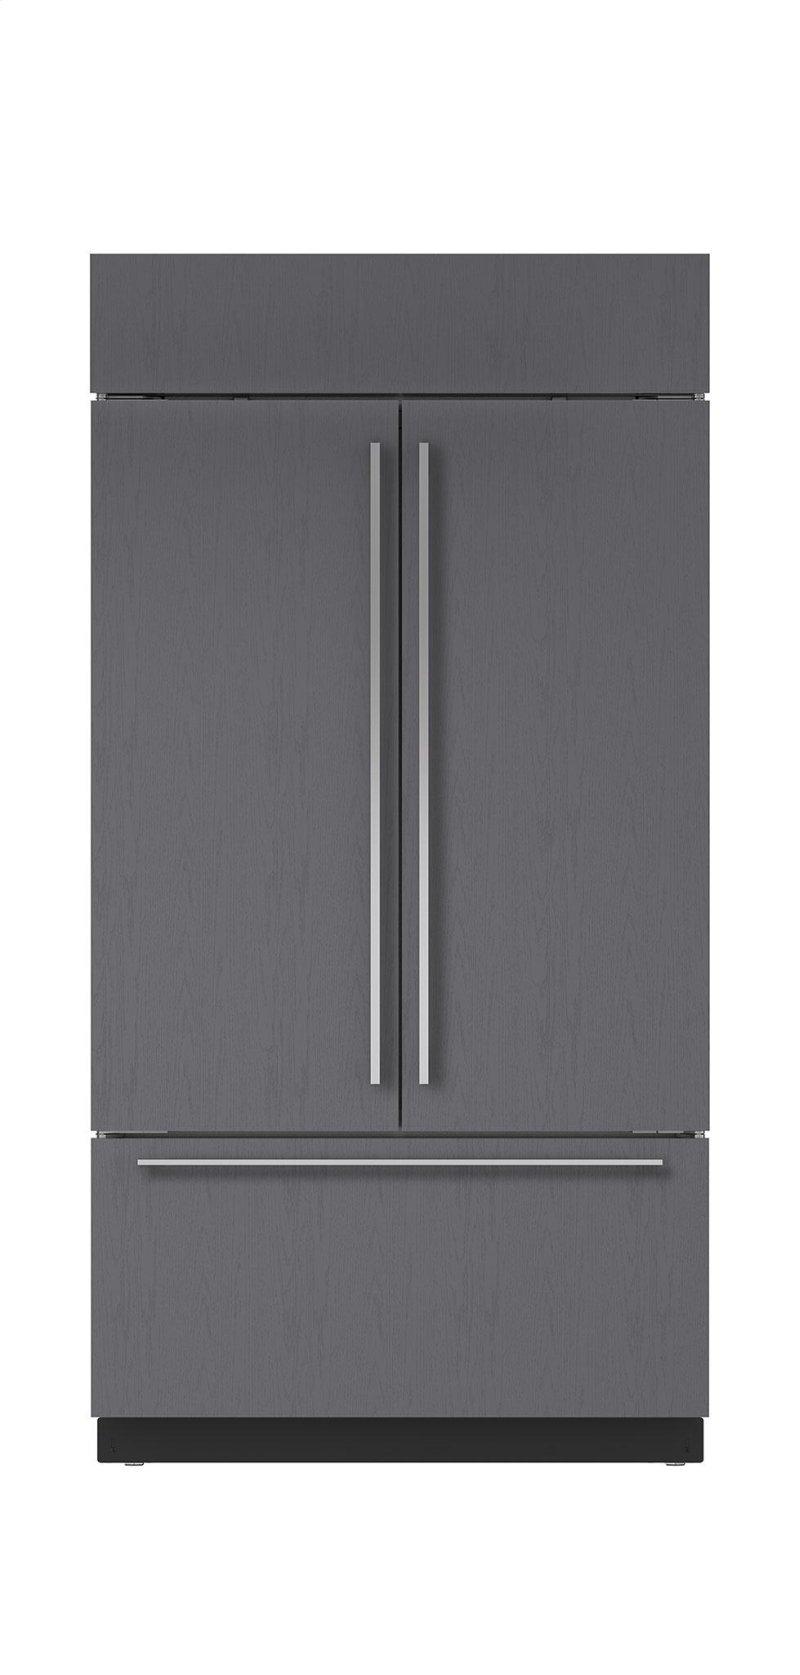 Bob wallace appliance huntsville alabama - 42 Built In French Door Refrigerator Freezer With Internal Dispenser Panel Ready